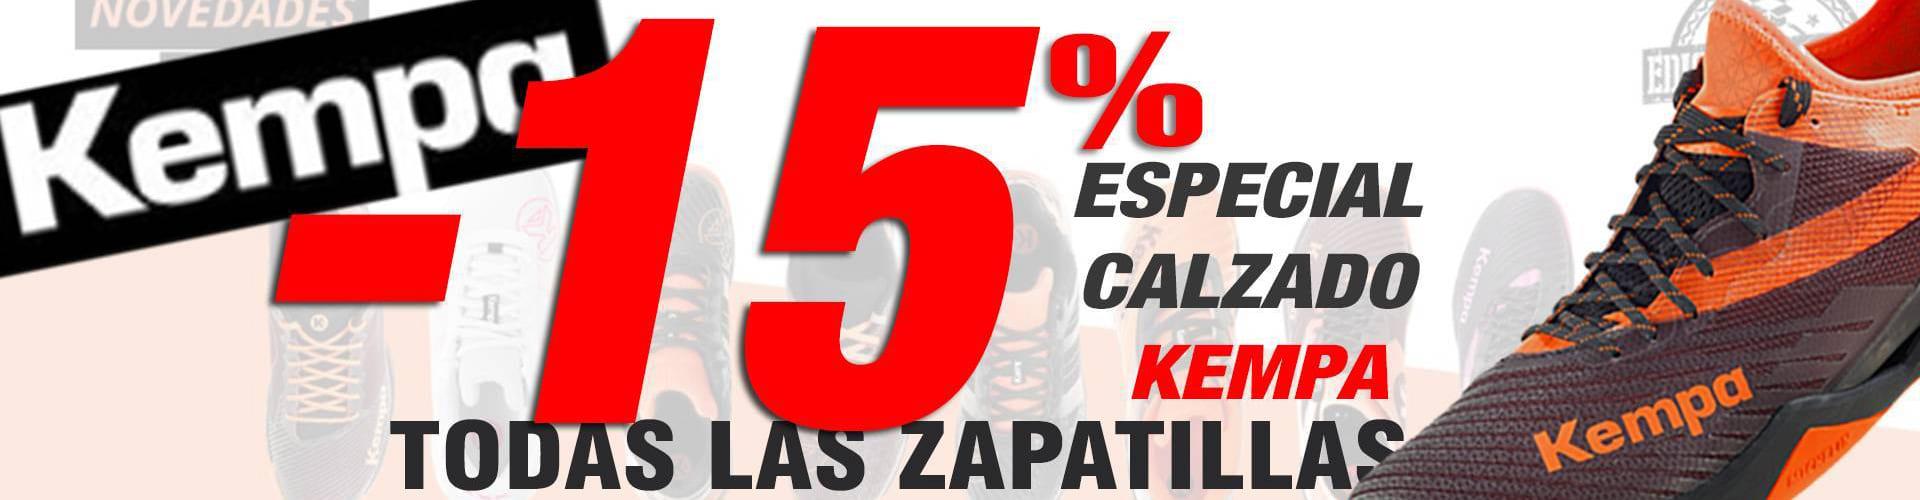 Oferta Zapatillas Kempa